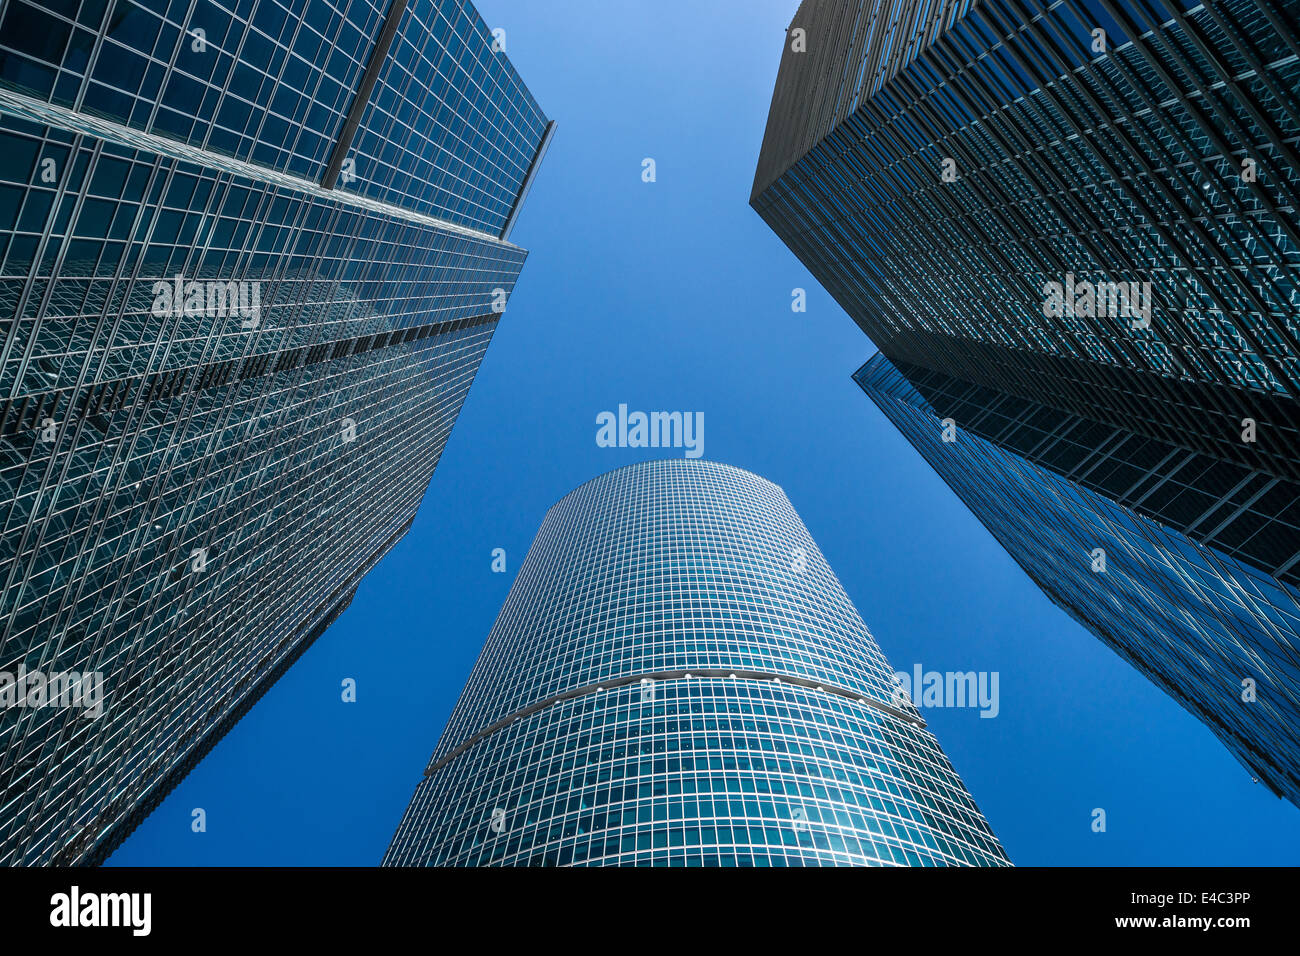 Moskau internationales Geschäftszentrum (Russland) Stockbild